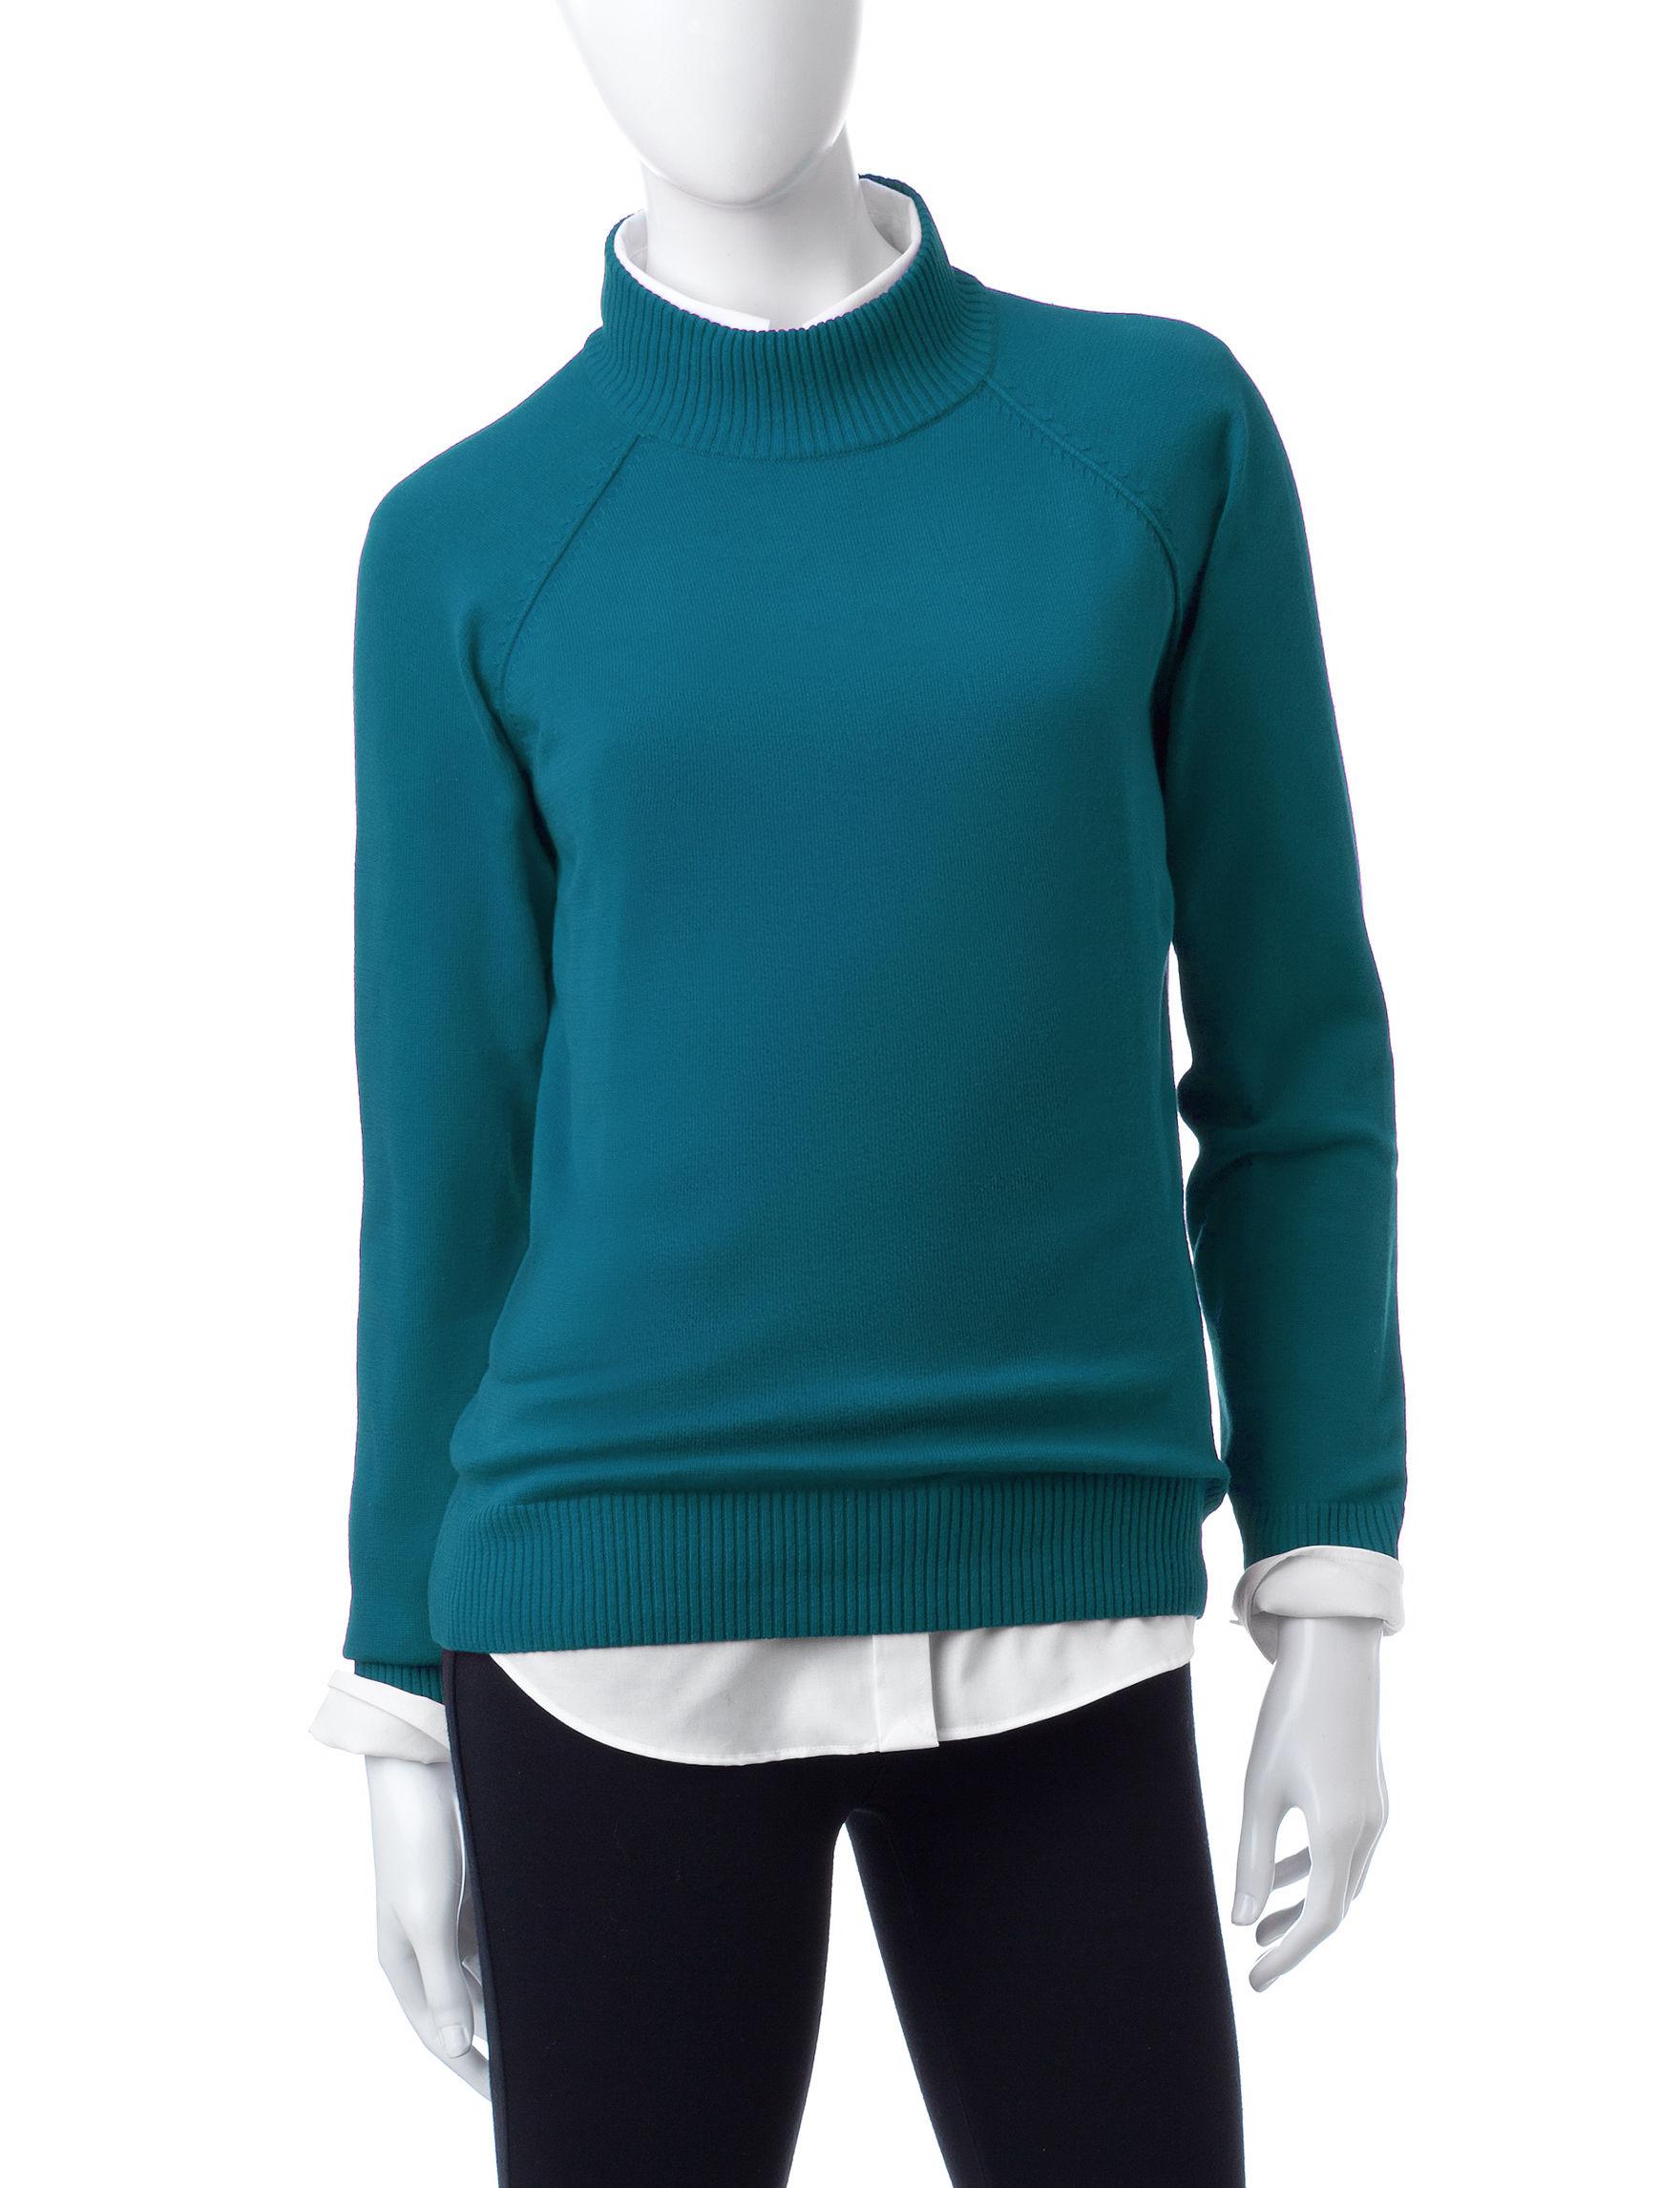 Jeanne Pierre Green Pull-overs Sweaters